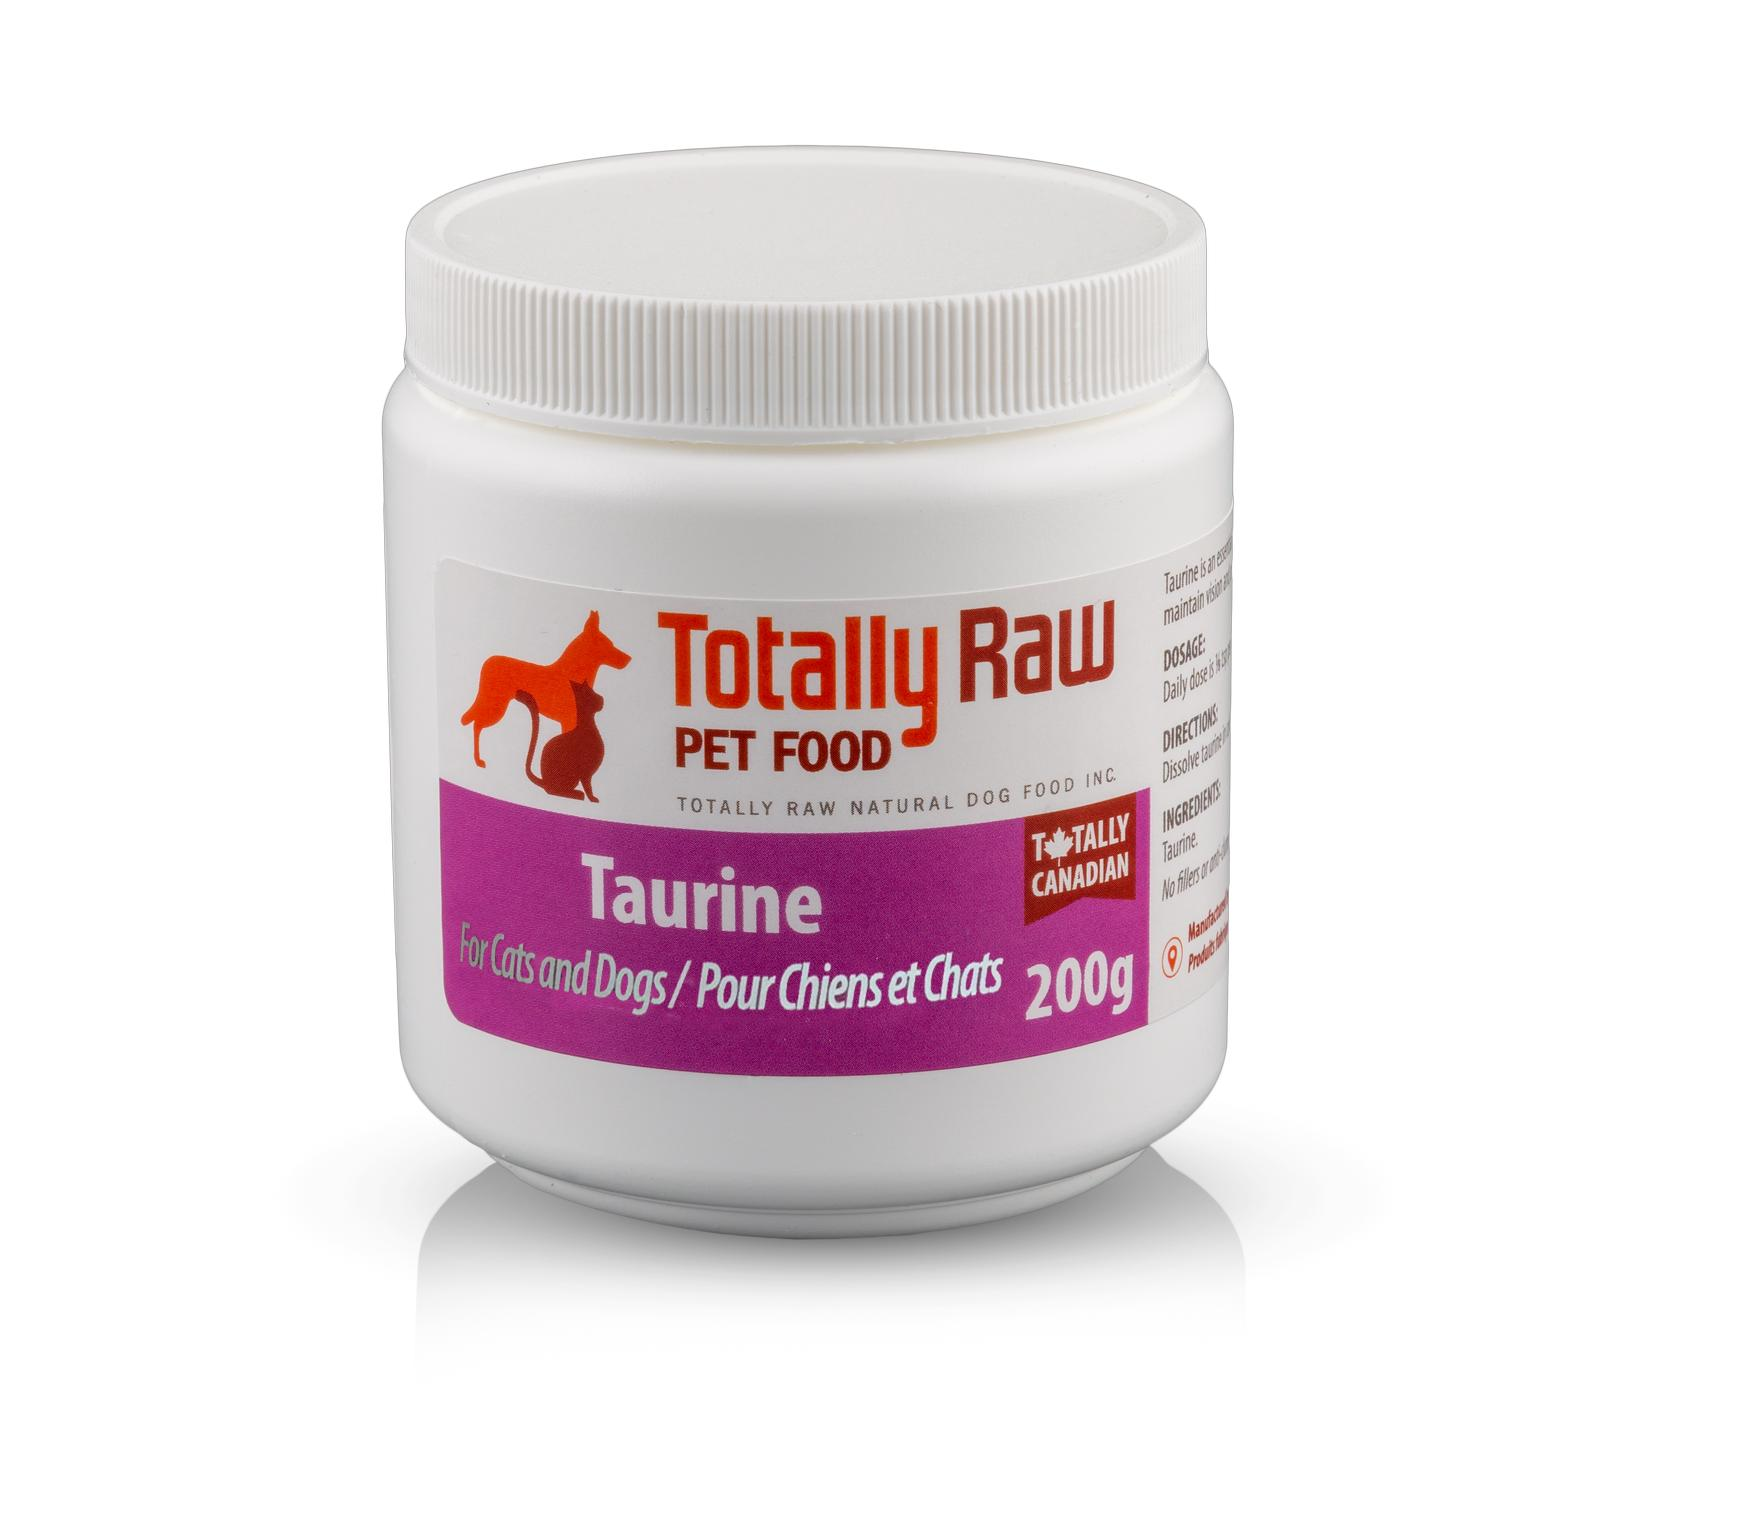 Totally Raw Pet Food Taurine Pet Supplement, 200-gram